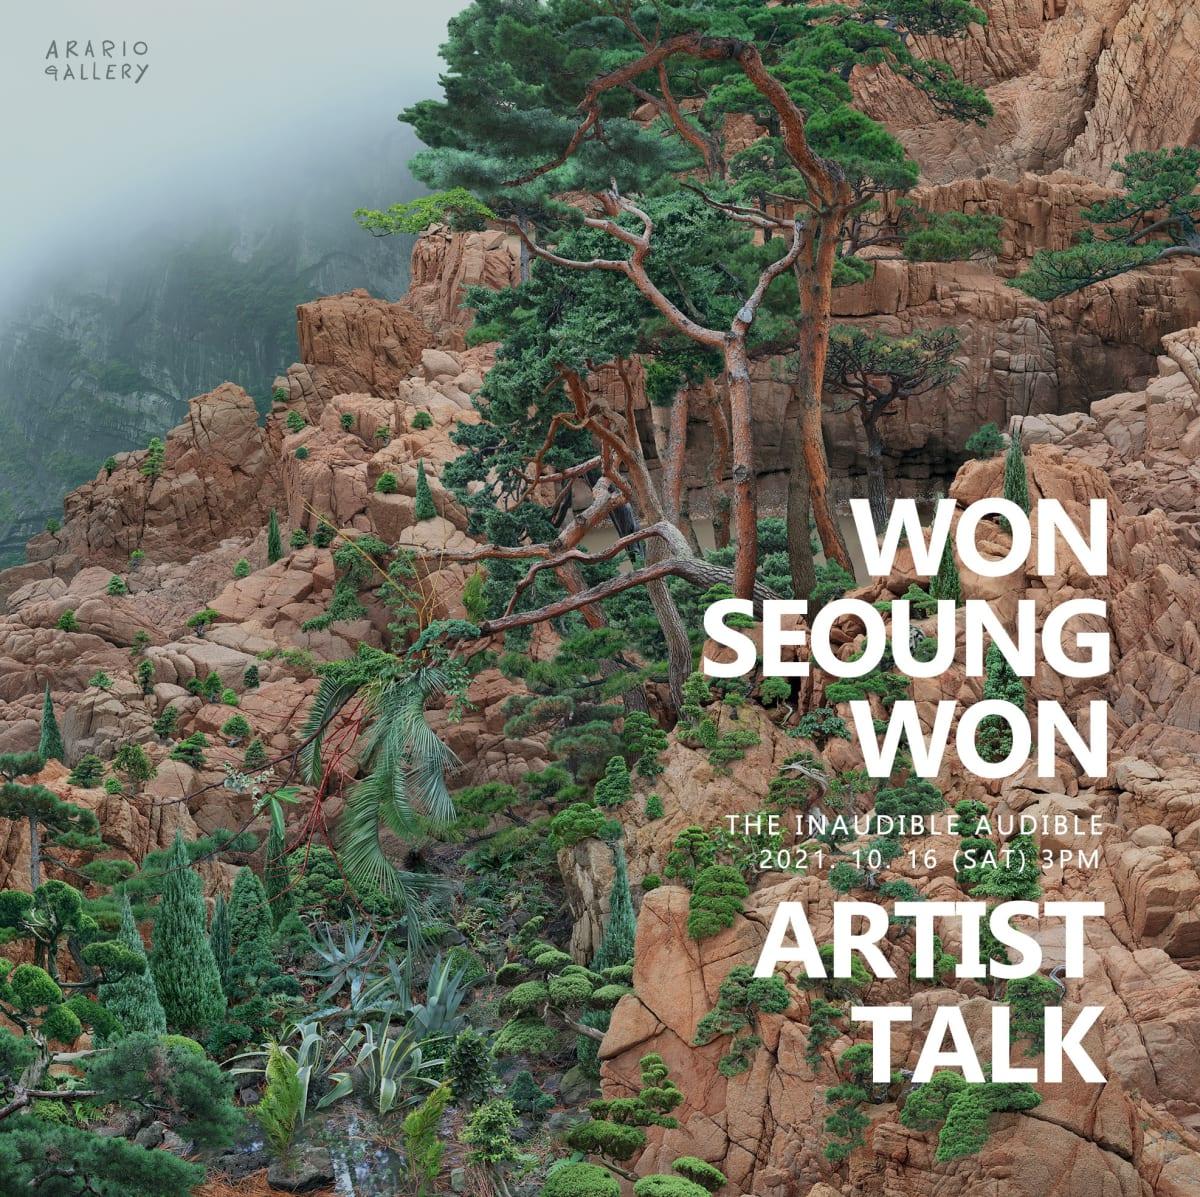 [Gallery] WON Seoung Won: Artist Talk